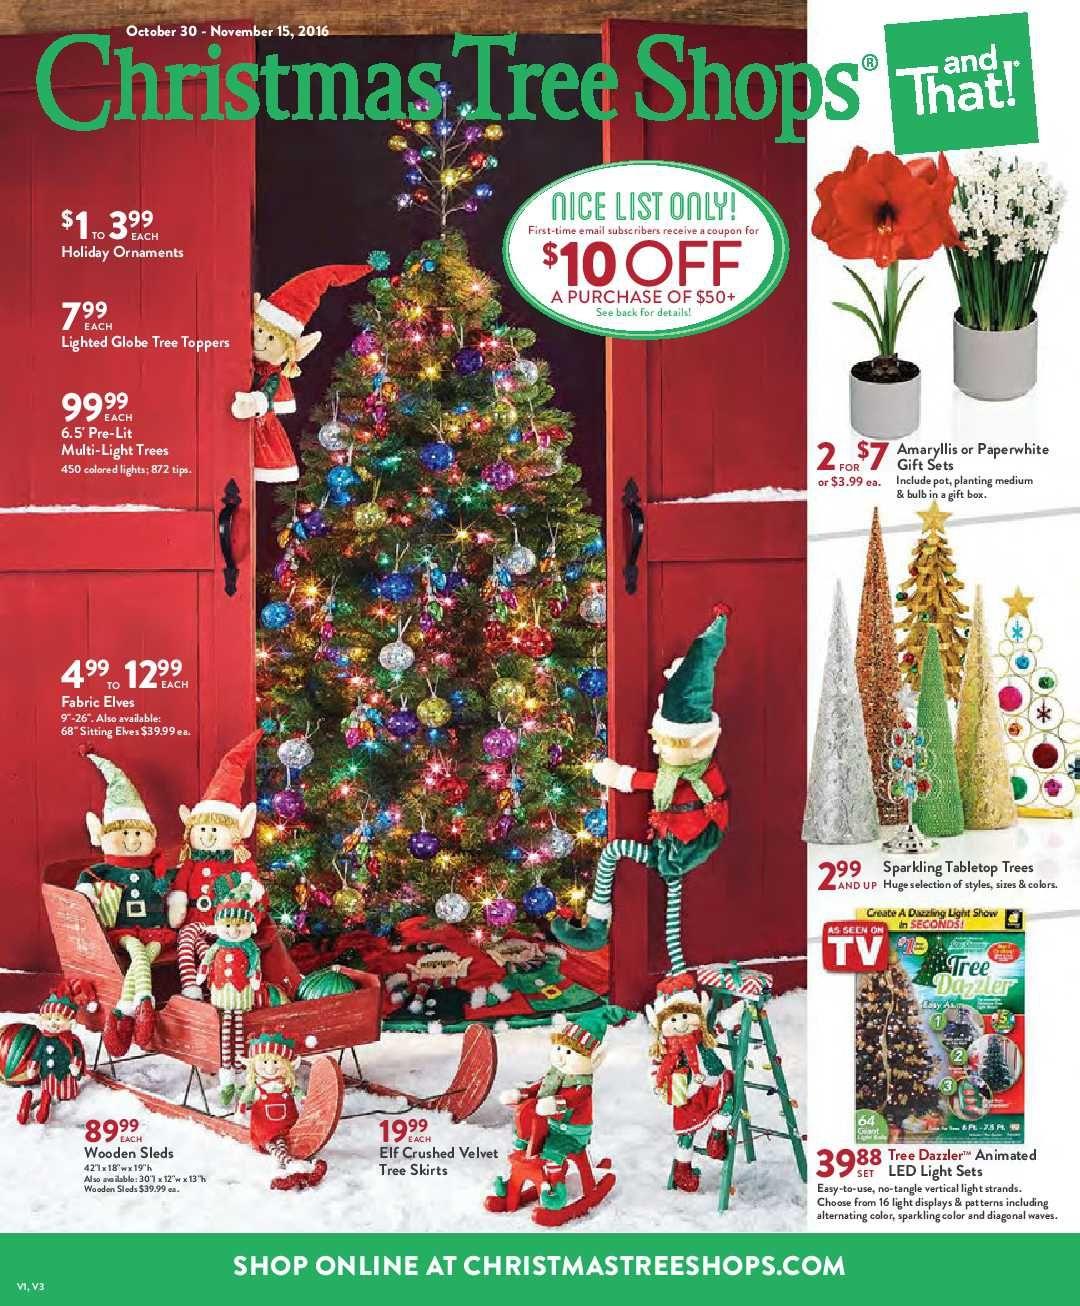 Christmas Tree Shops Ad November 3 - 15, 2016 - http://www ...